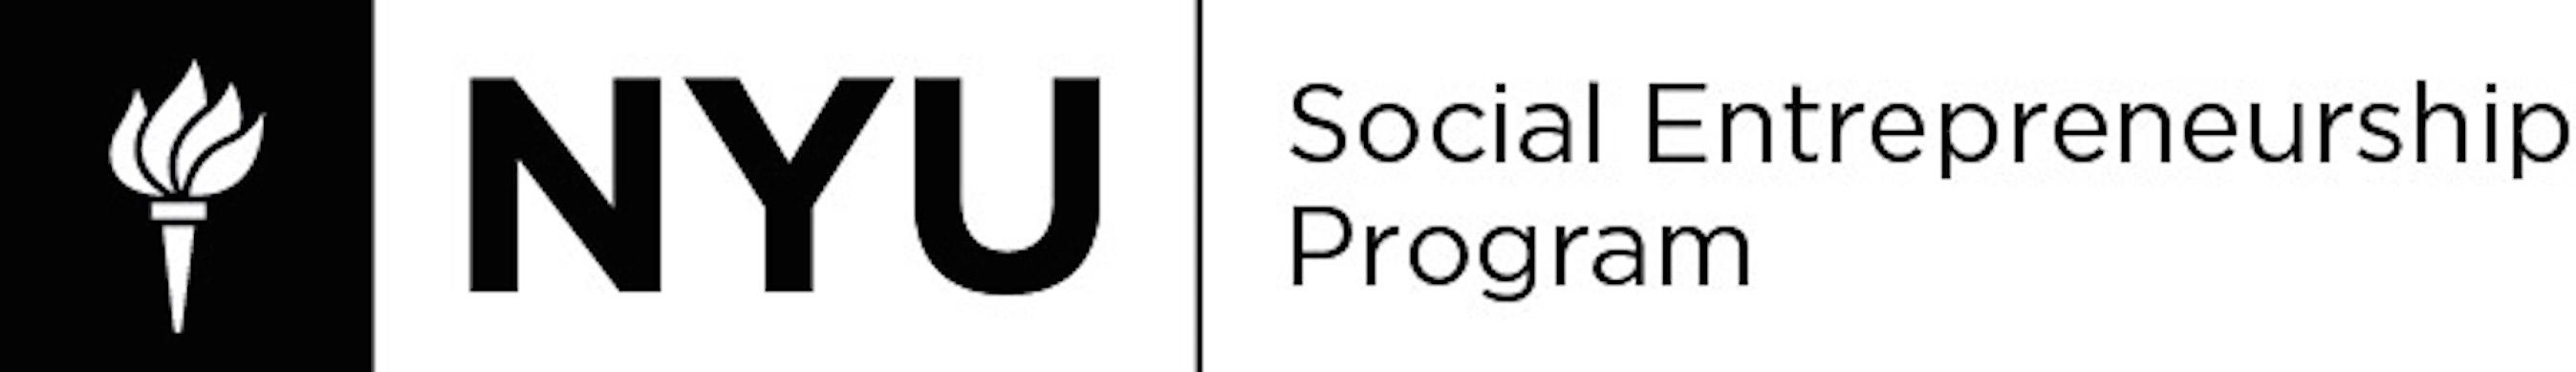 NYU Social Entrepreneurship Program logo